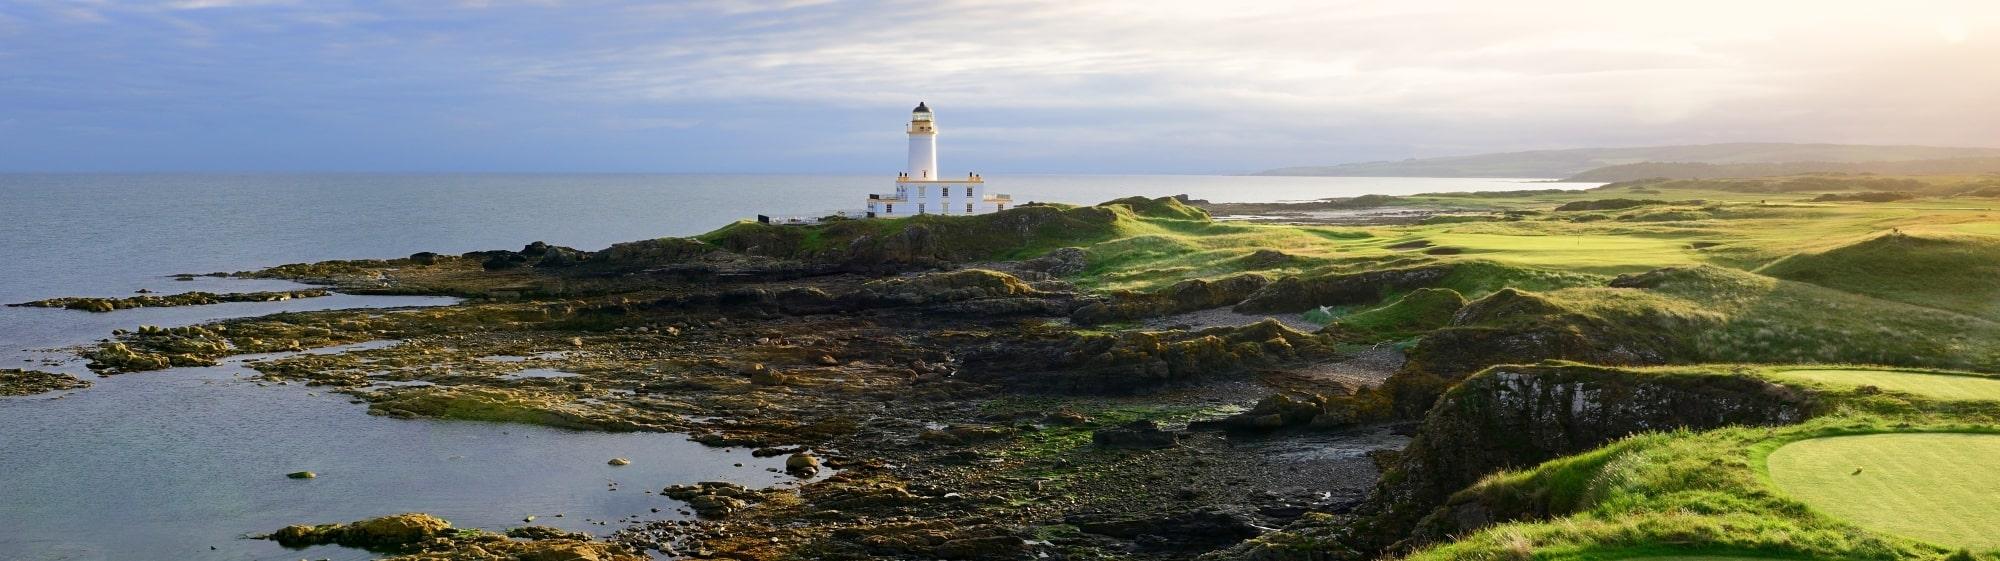 Golf vacation scotland